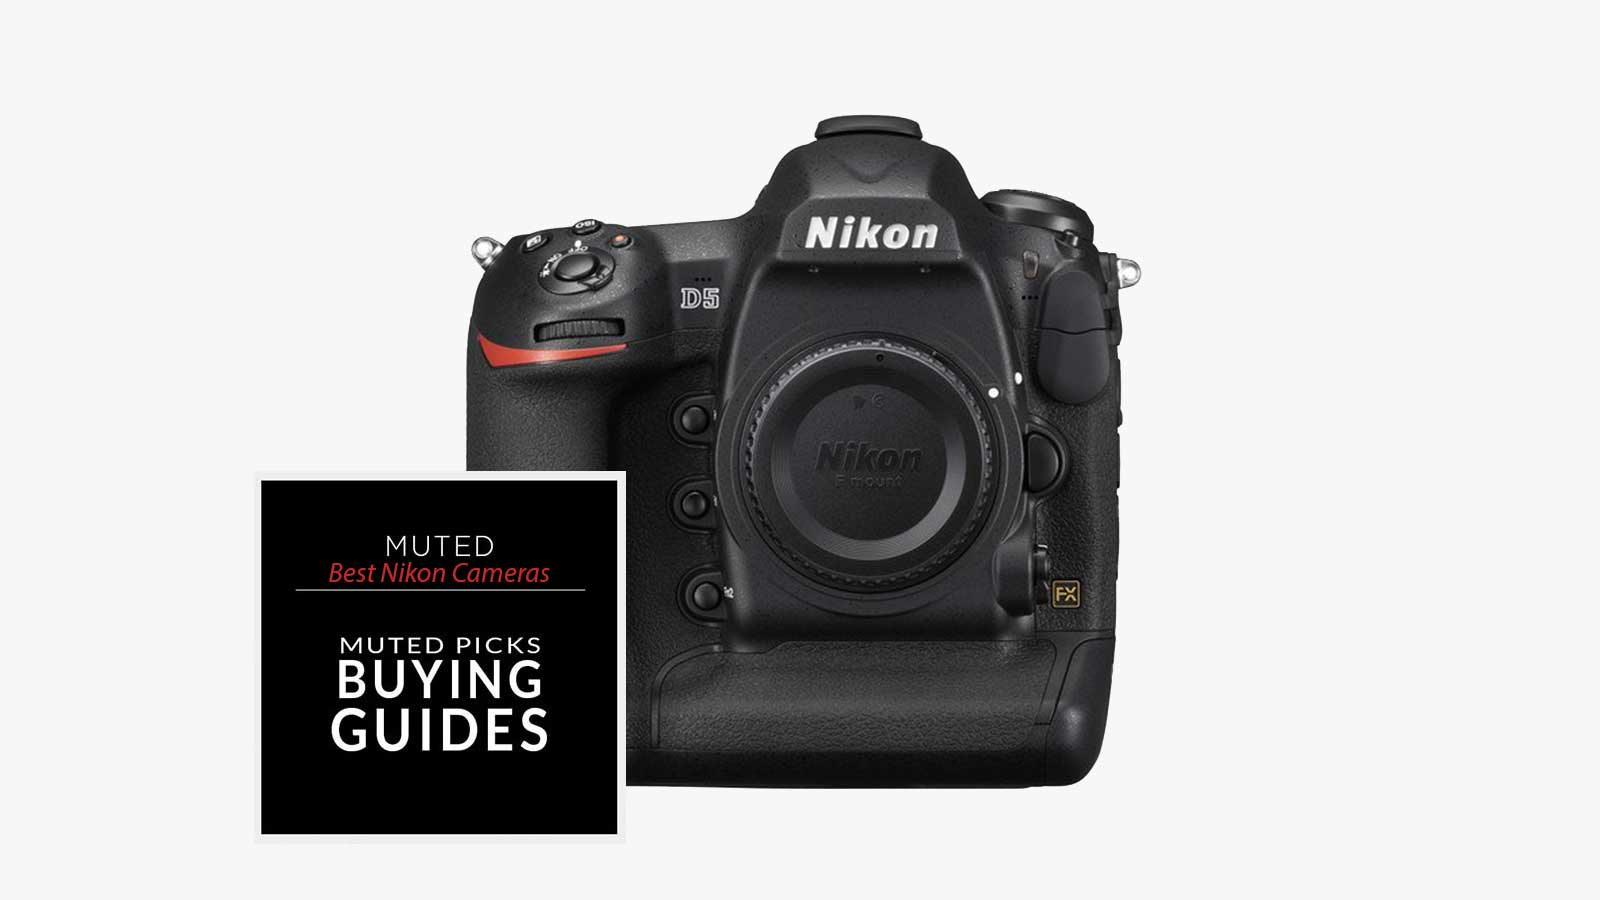 Best Nikon Cameras For Every Budget